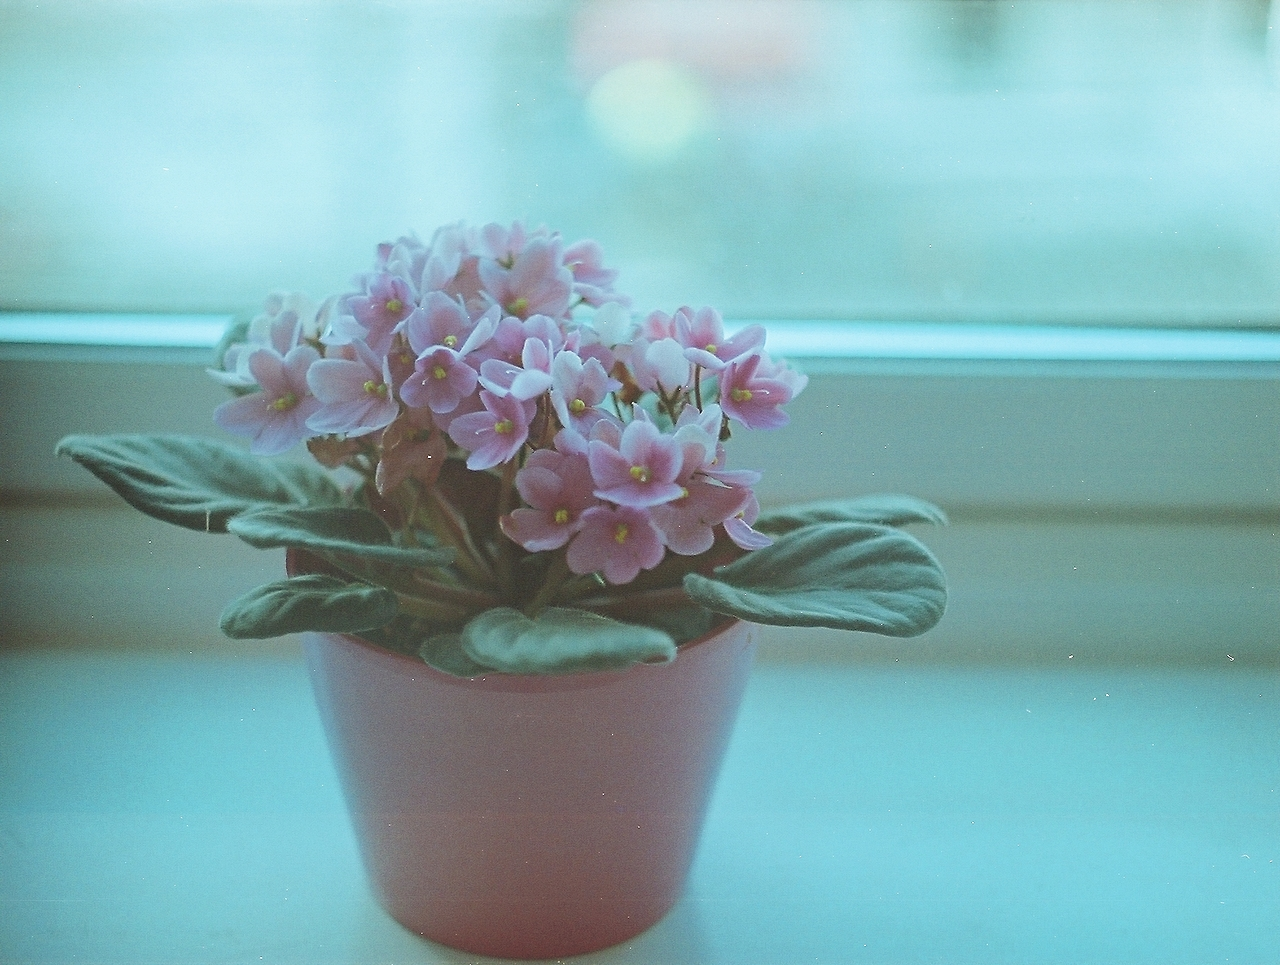 flower plant belgium florist.jpg